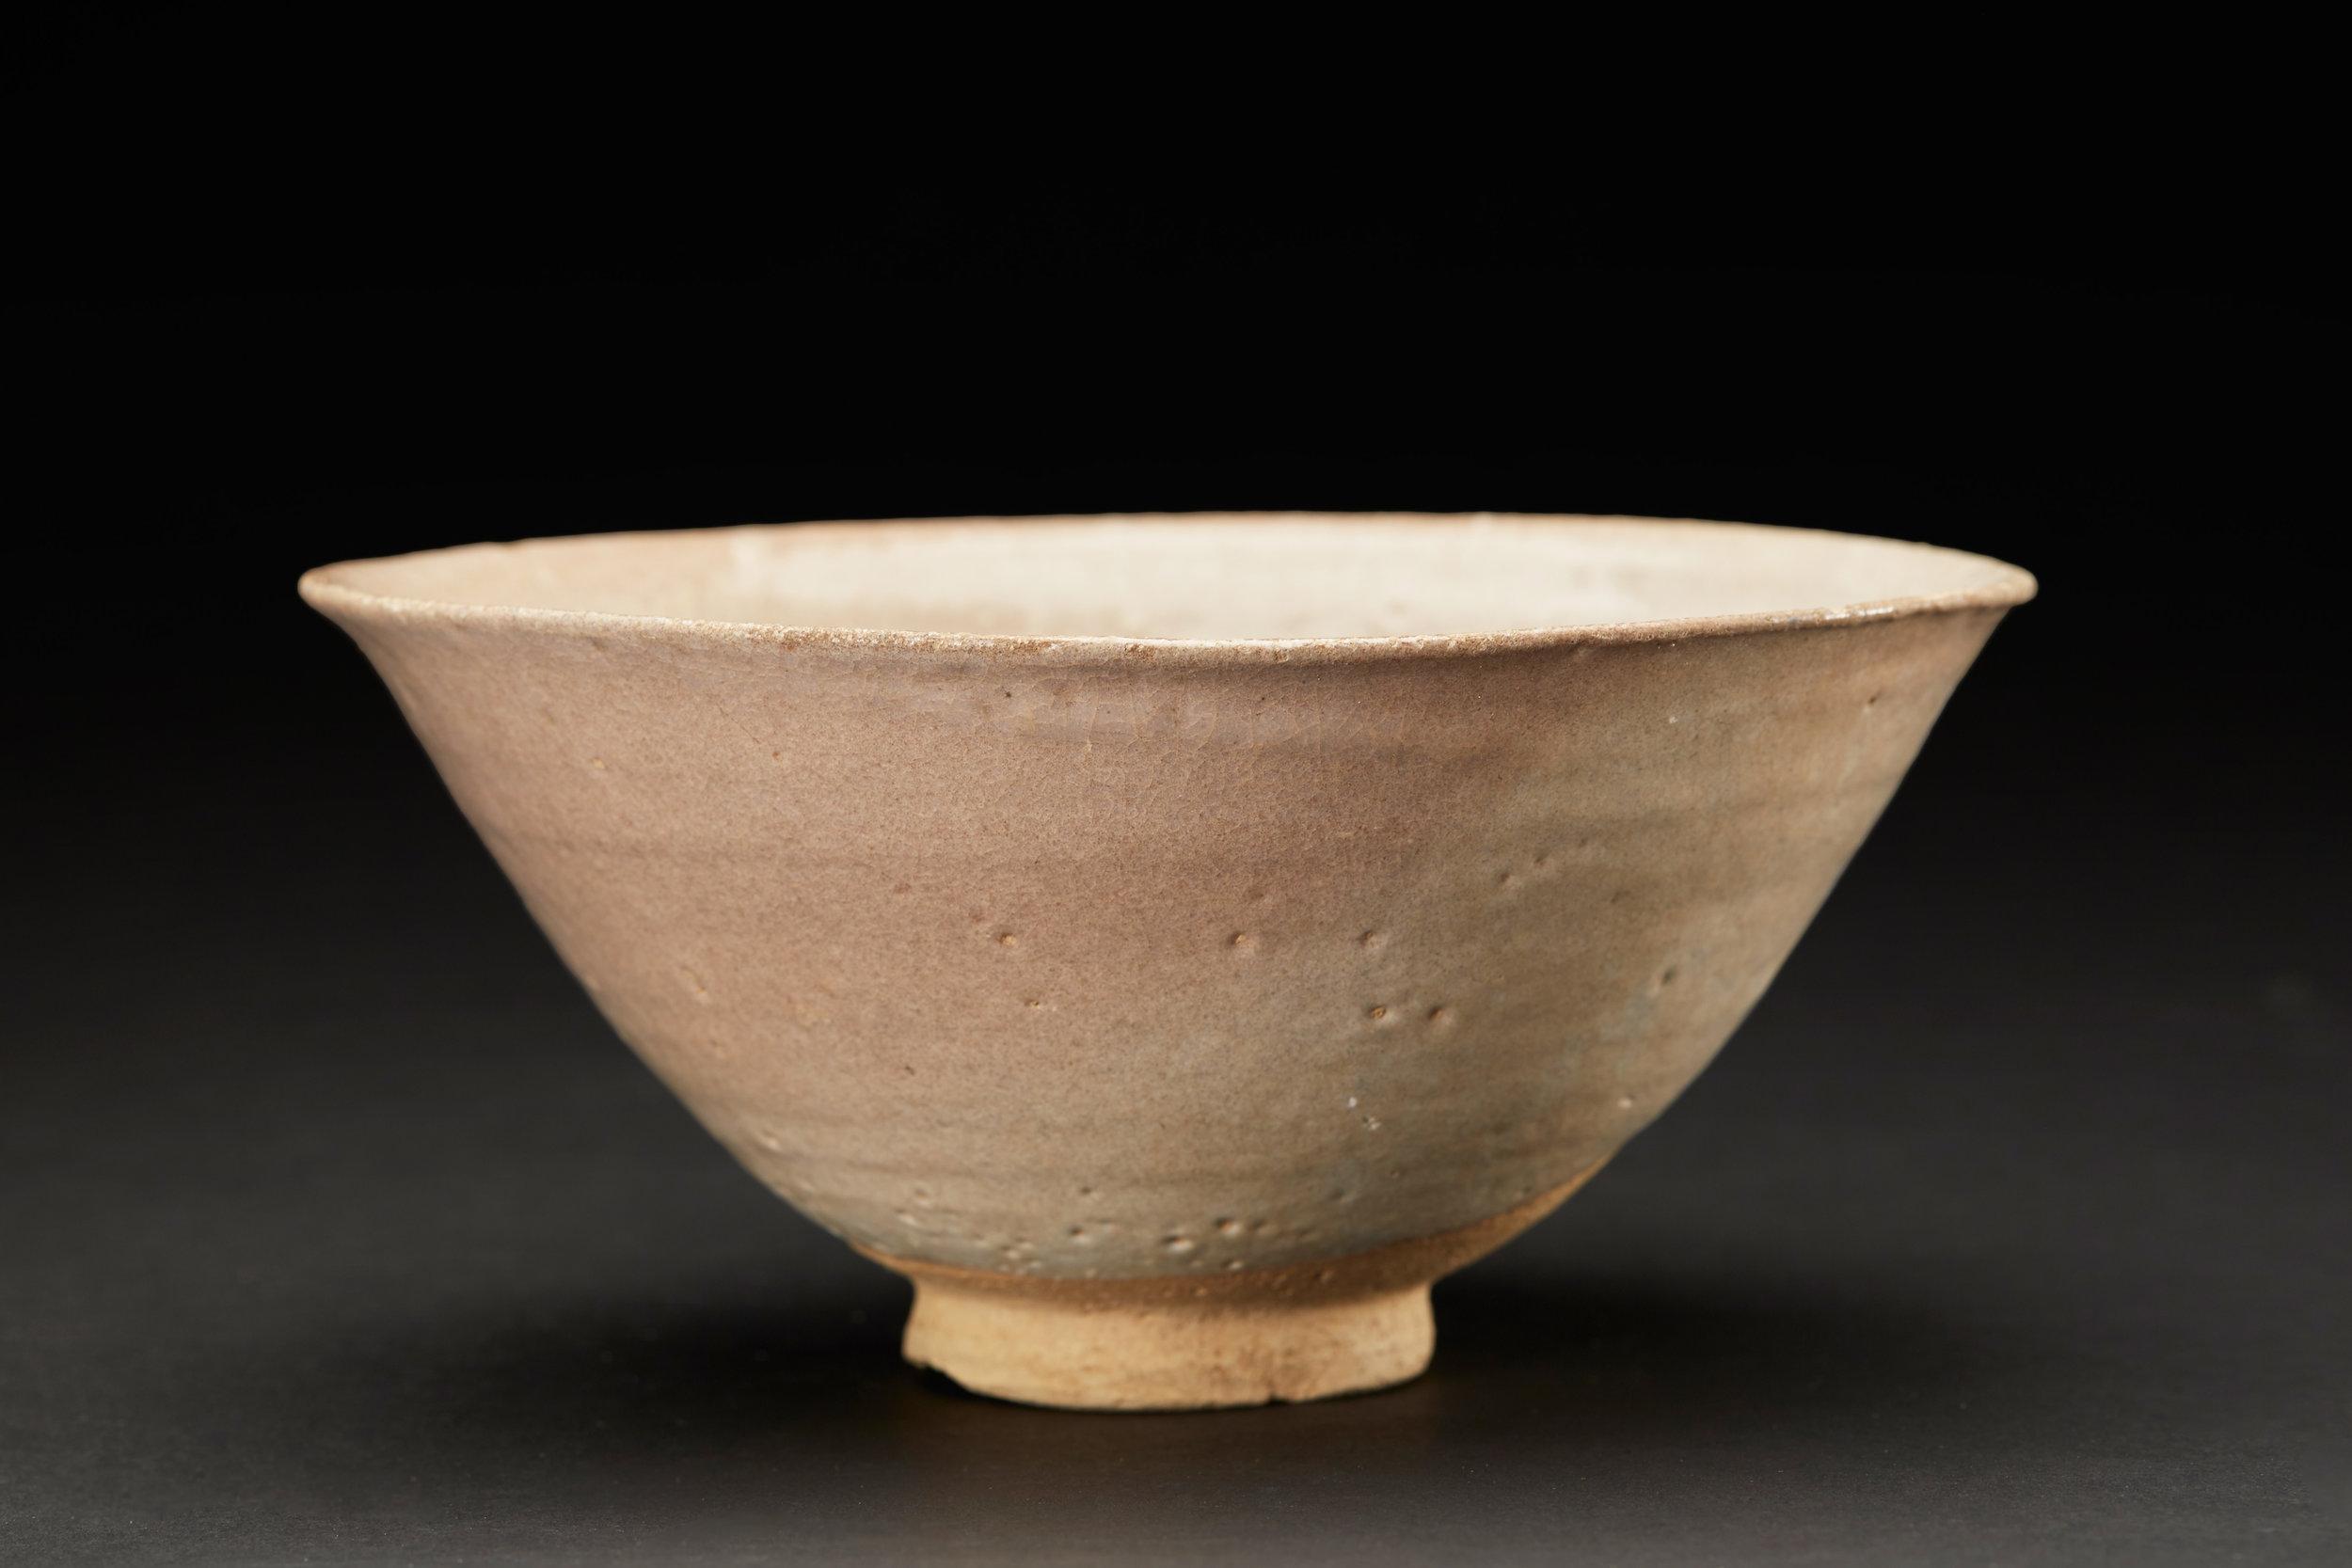 Korean Ceramics  Punchon Rose Colored Tea bowl  , C. Early-Mid Chosun Period (16-17th Century) Porcelain with Celadon Glaze 7 x 3.5 inches 17.8 x 8.9 cm KCer 14